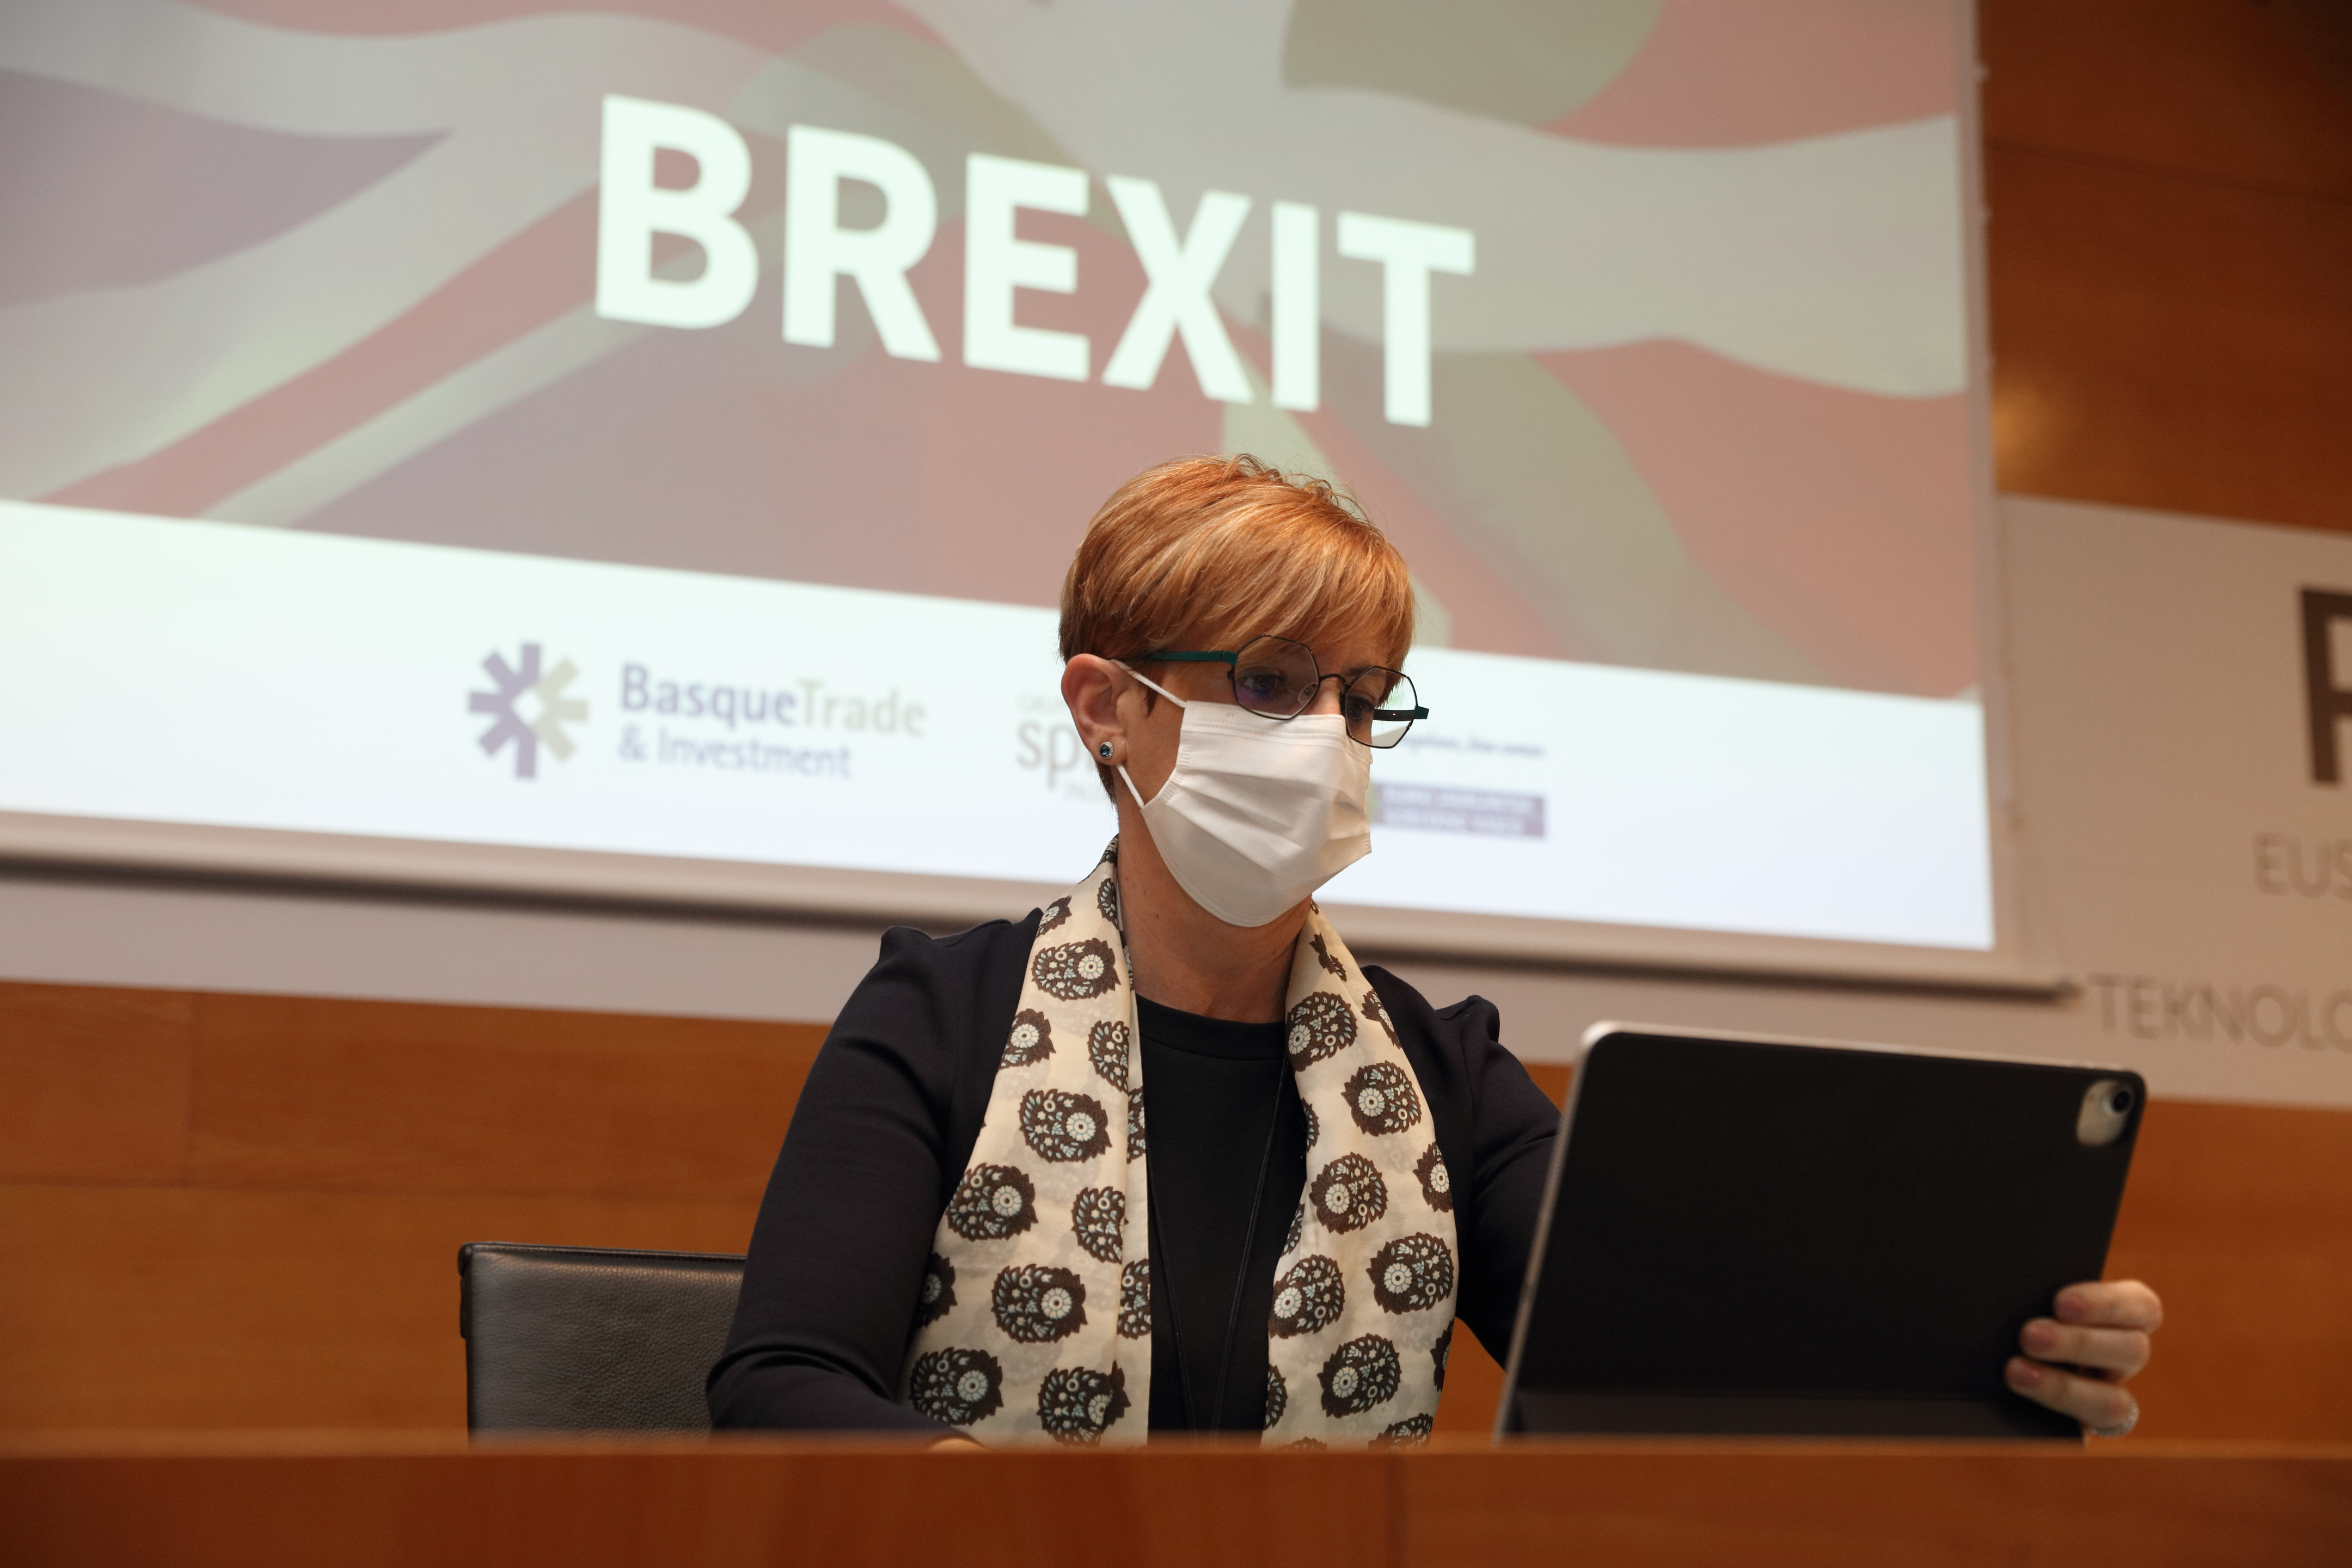 Brexit_006.JPG